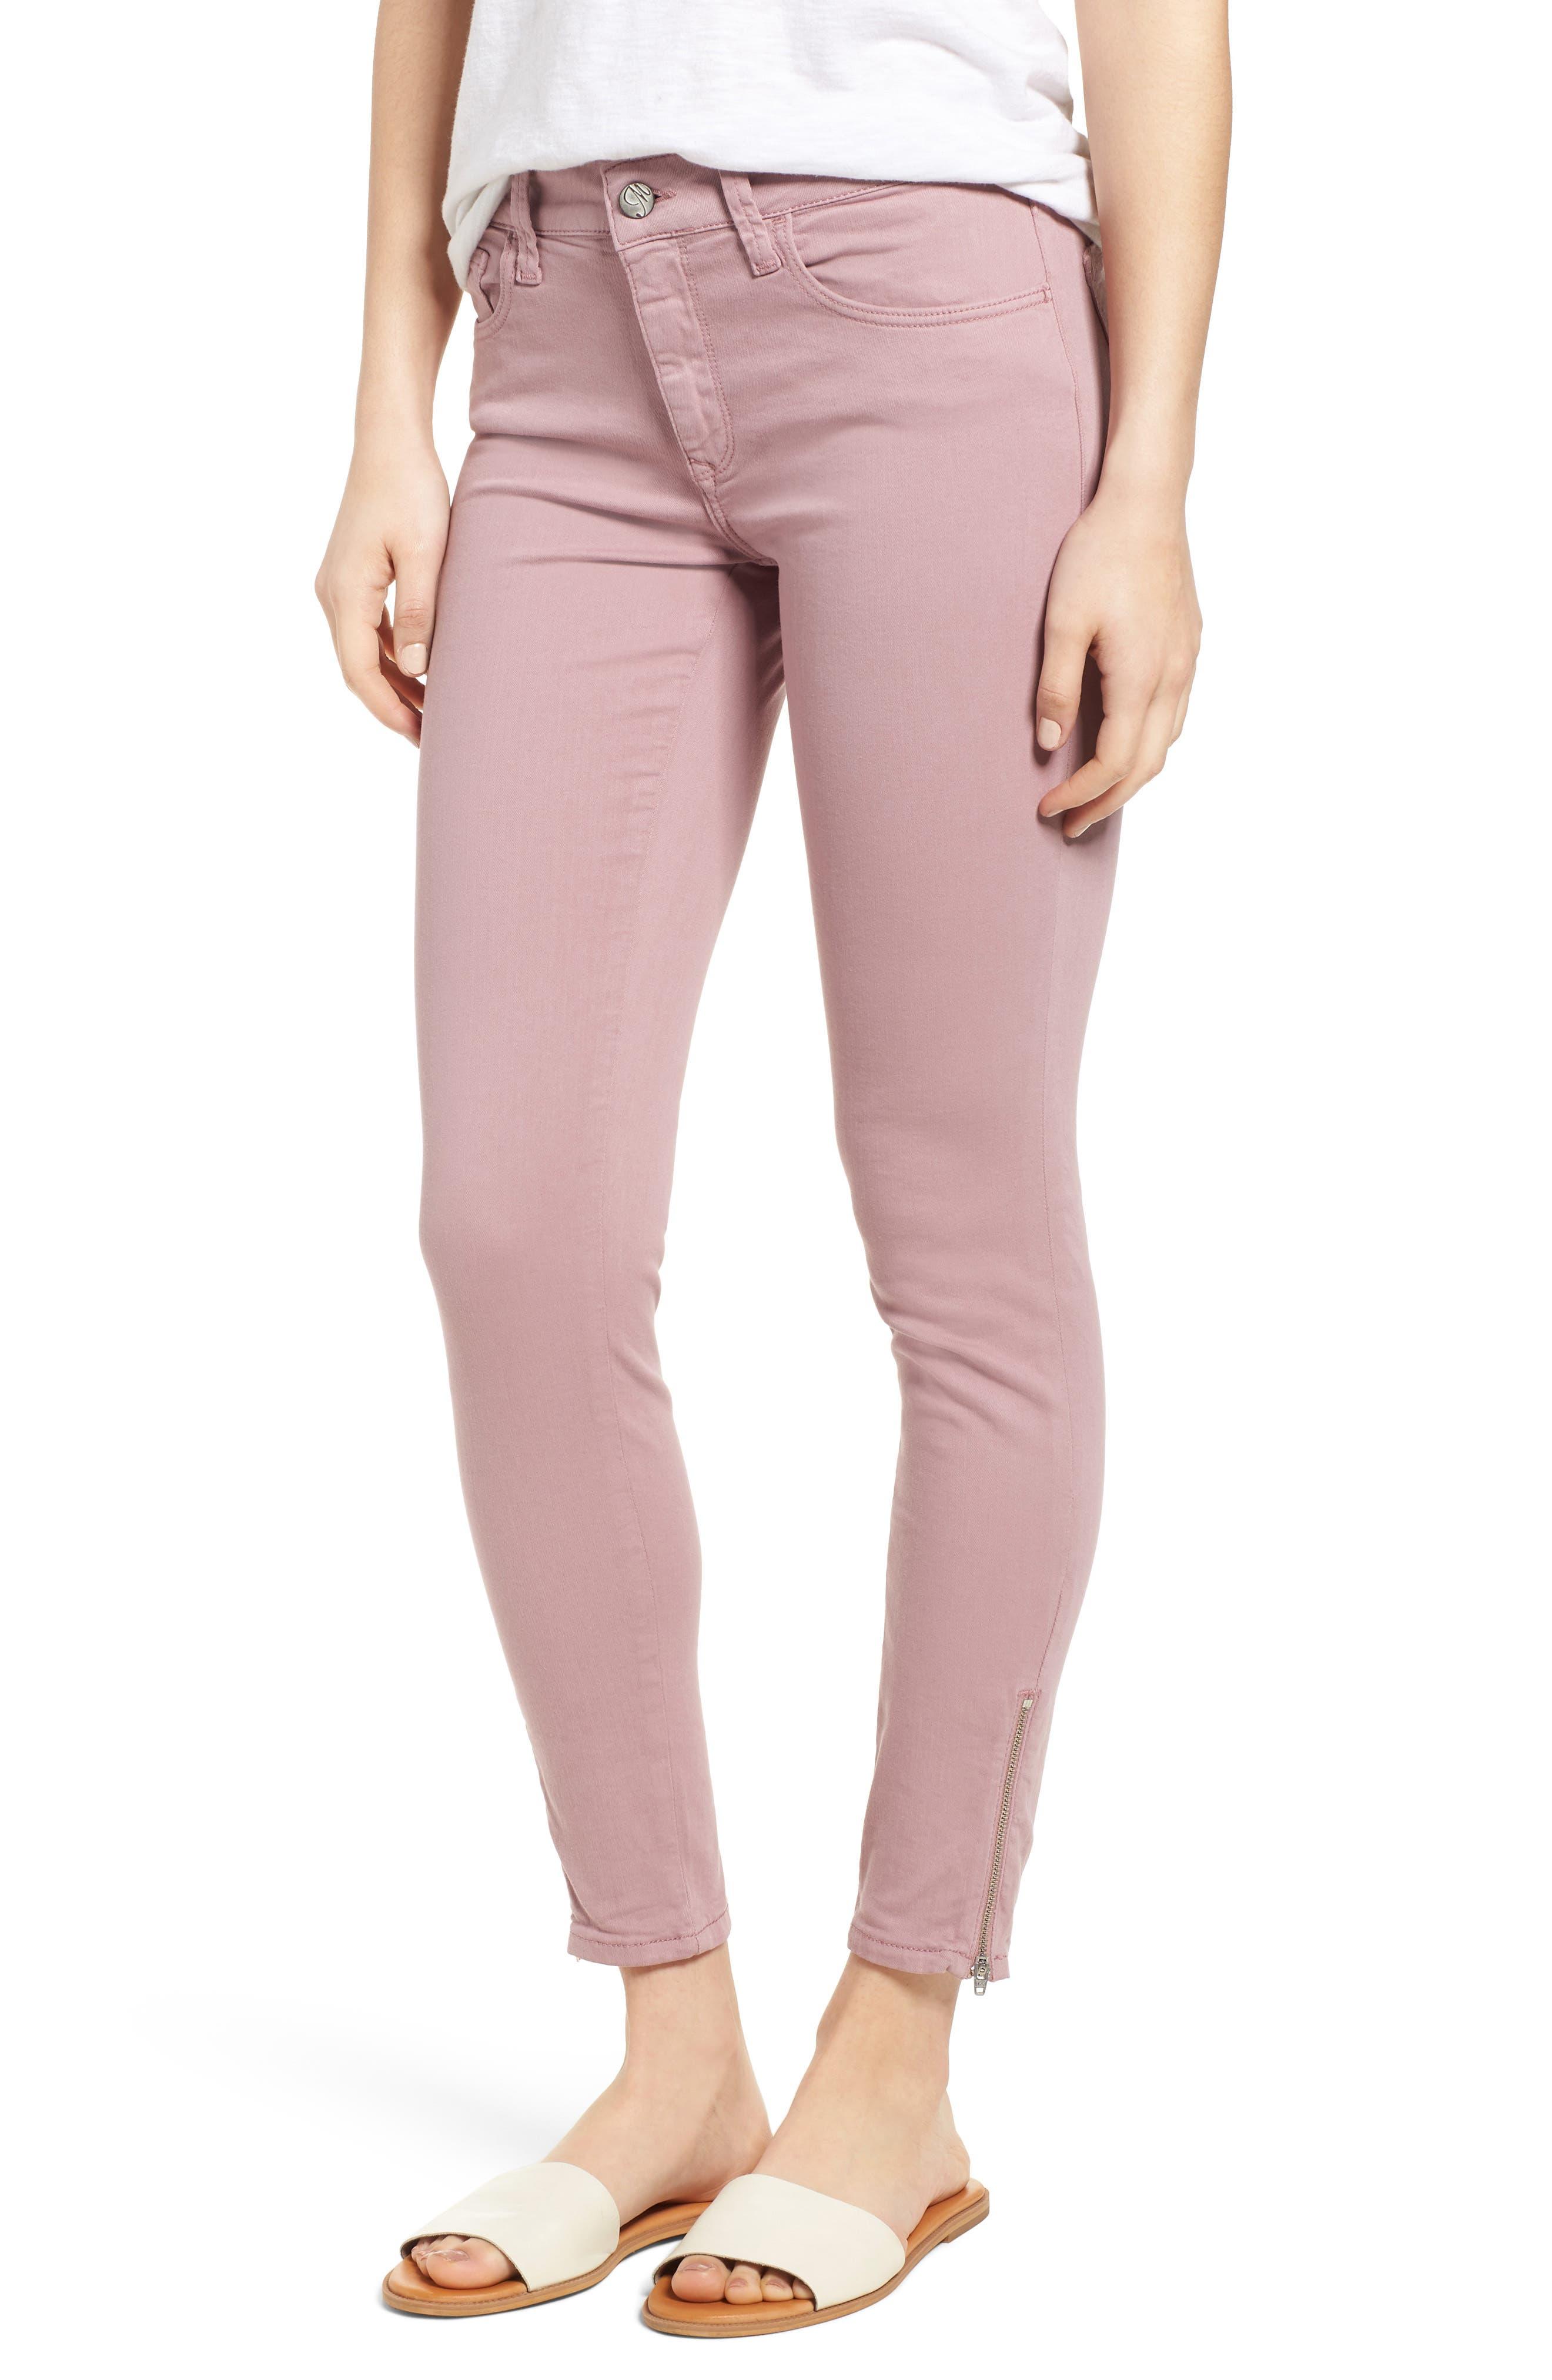 Mavi Jeans Adriana Zip Ankle Super Skinny Jeans (Light Rose Twill)